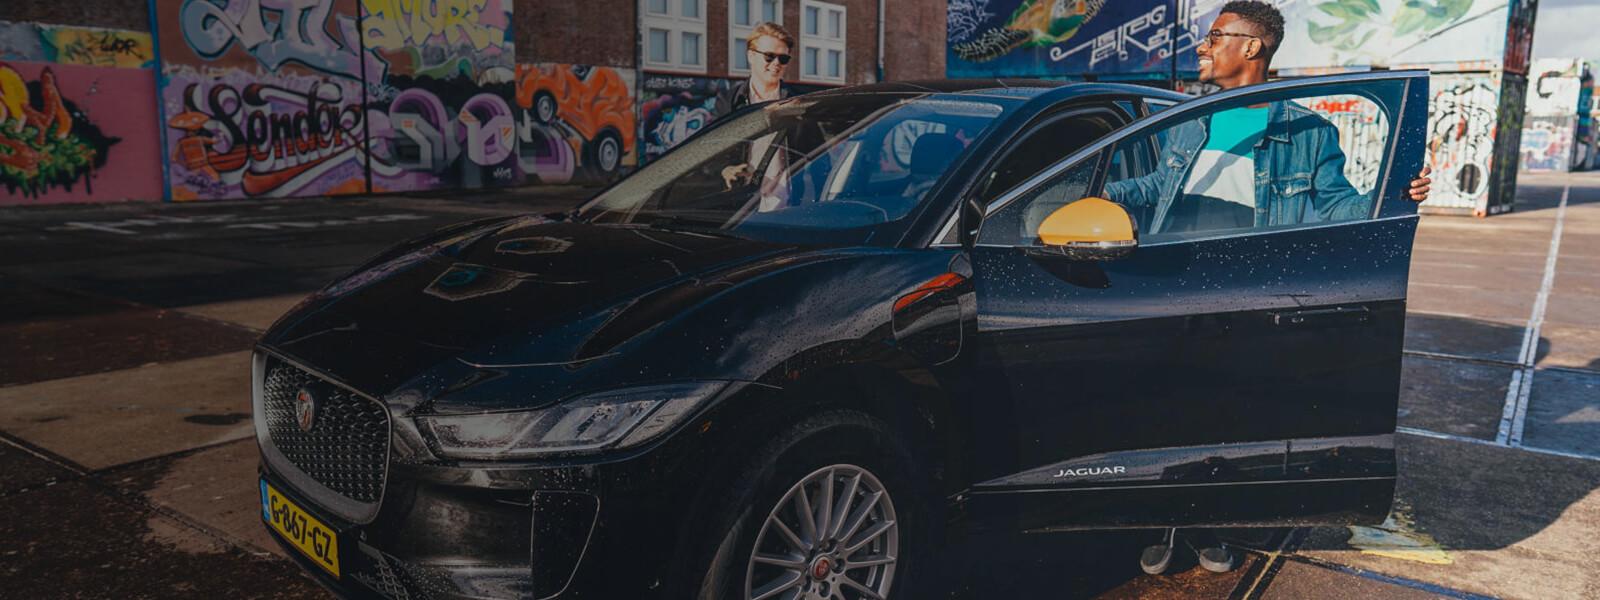 sixt share carsharing amsterdam slider